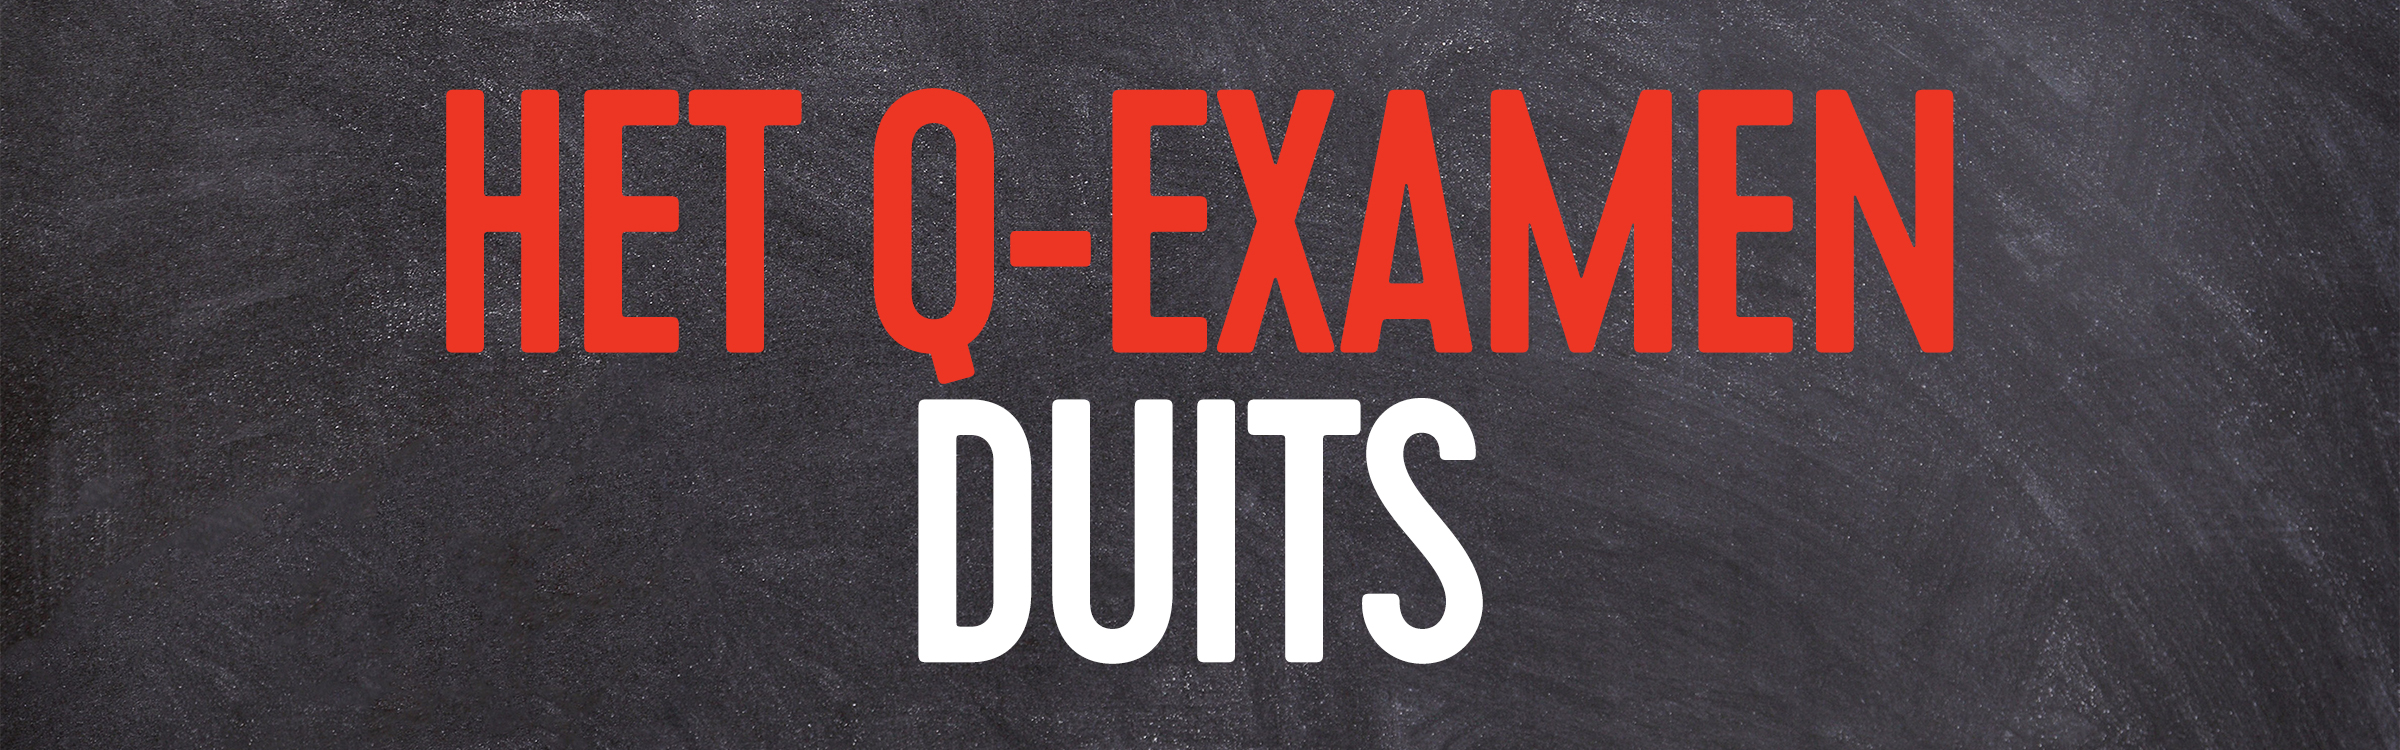 Q examen duits header